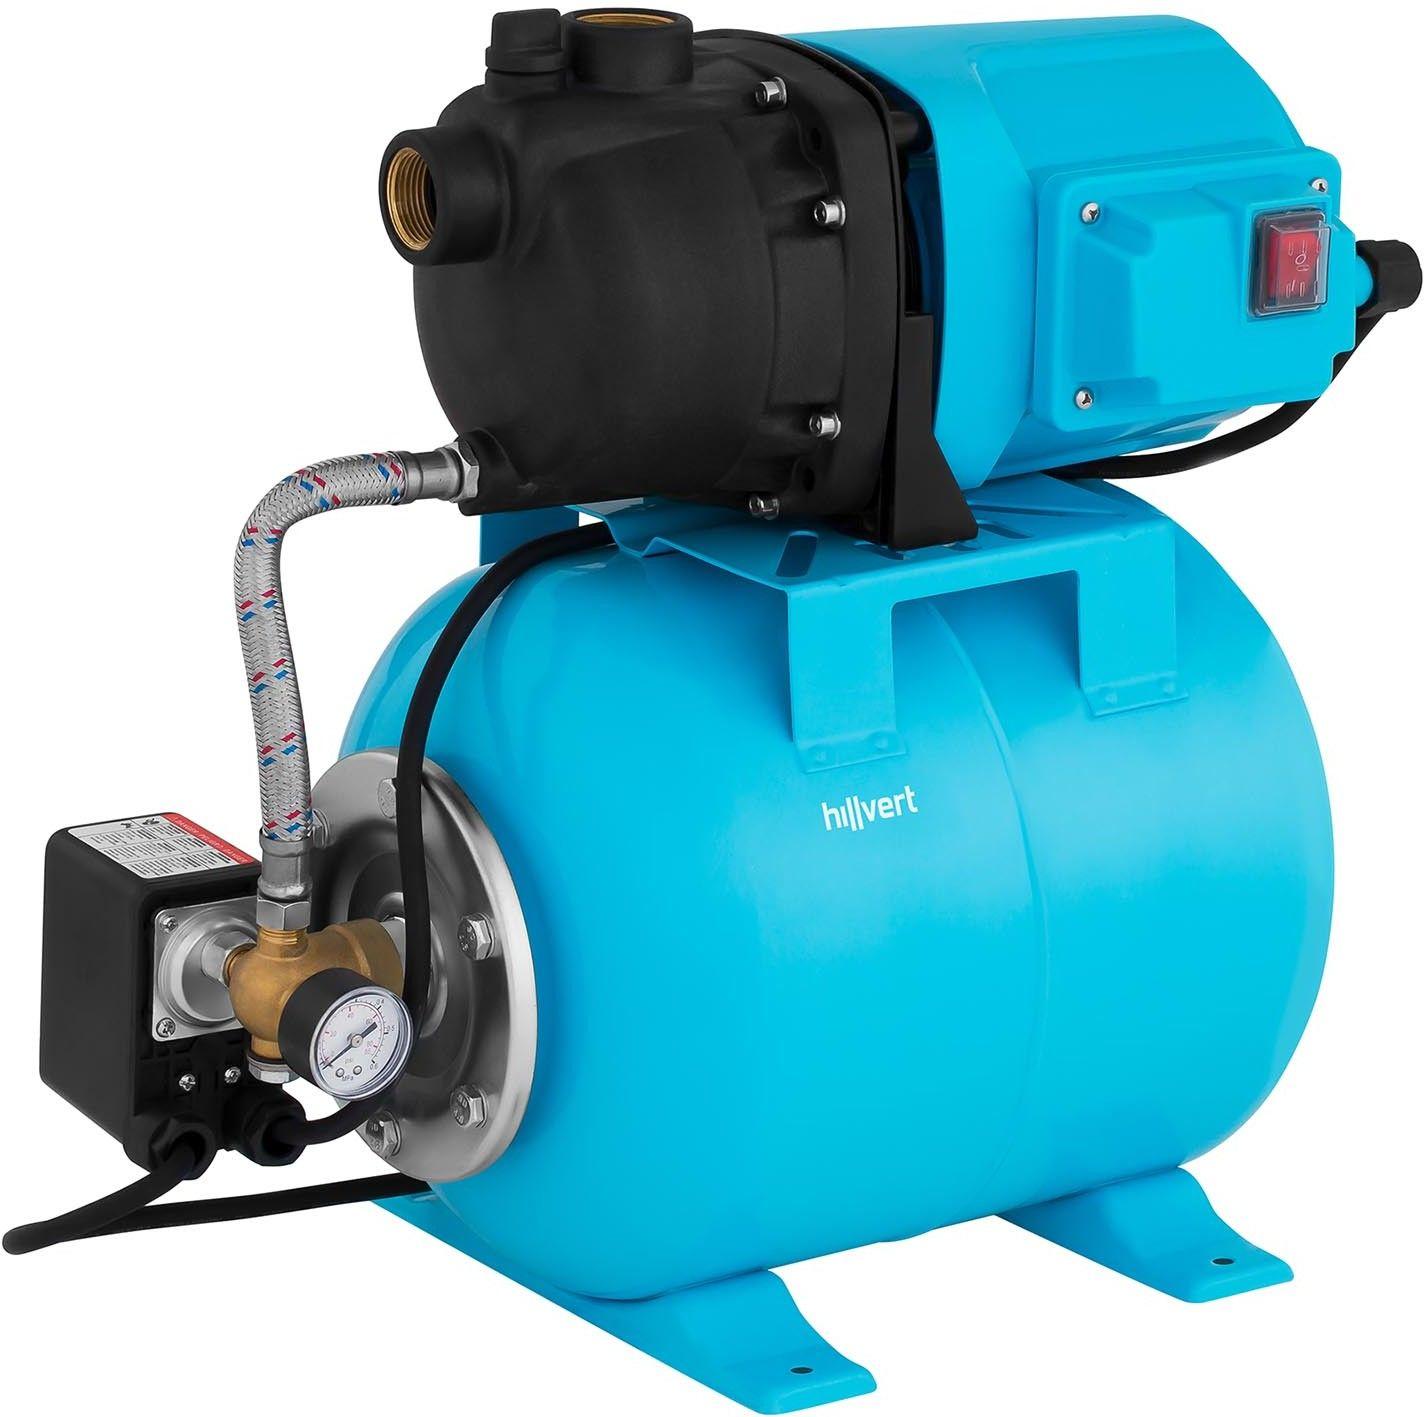 Pompa samozasysająca - 19 l - 1200W - Hillvert - HT-ROBSON-JP1200CP - 3 lata gwarancji/wysyłka w 24h